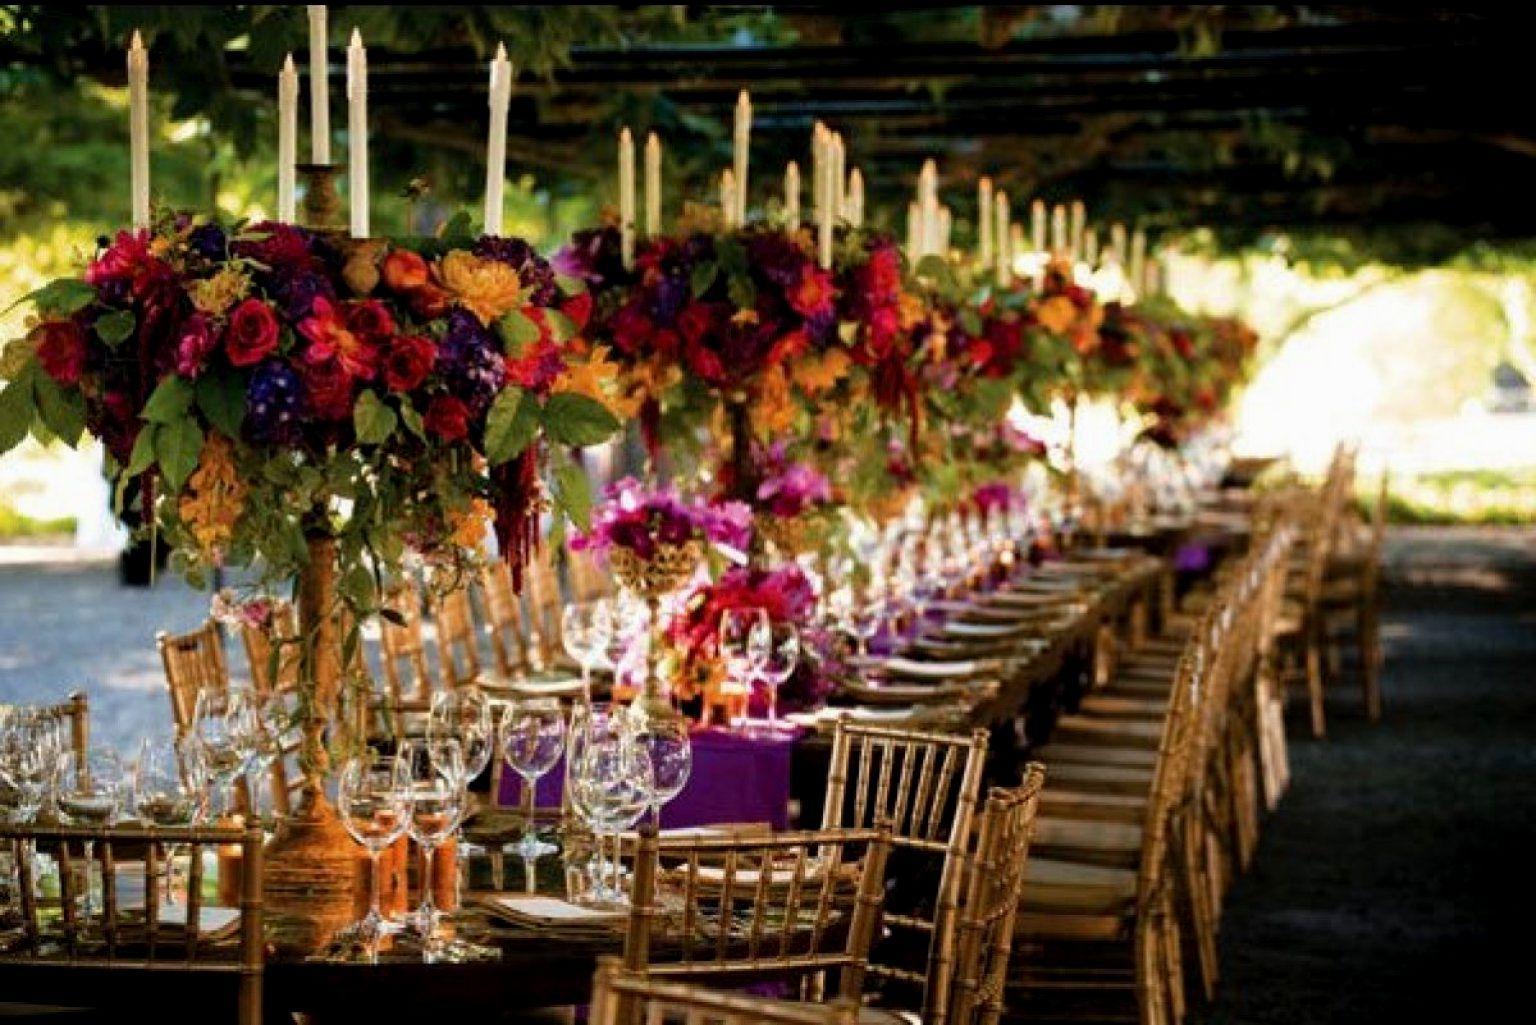 Fall Table Centerpiece Wedding Ideas: Autumn Wedding Table Decorations Uk